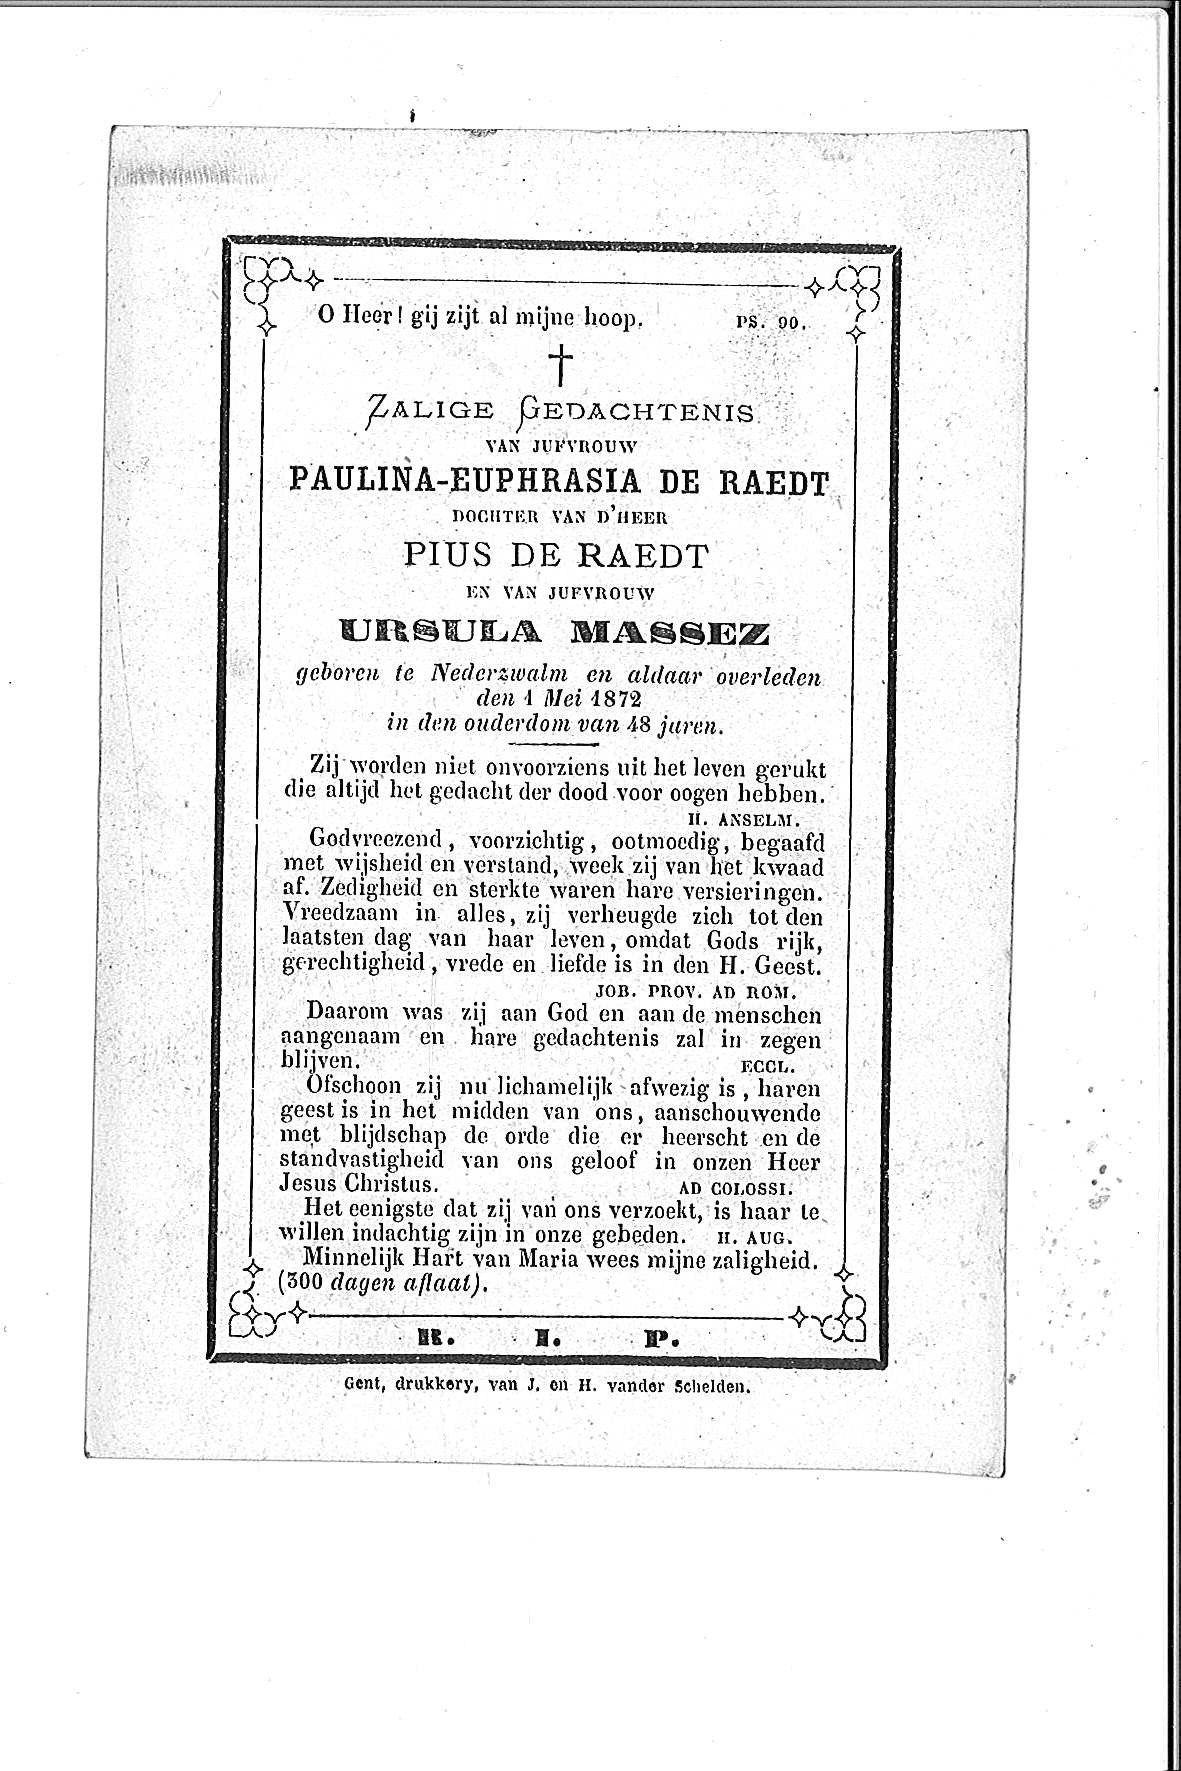 Paulina-Euphrasie(1872)20150420141904_00004.jpg